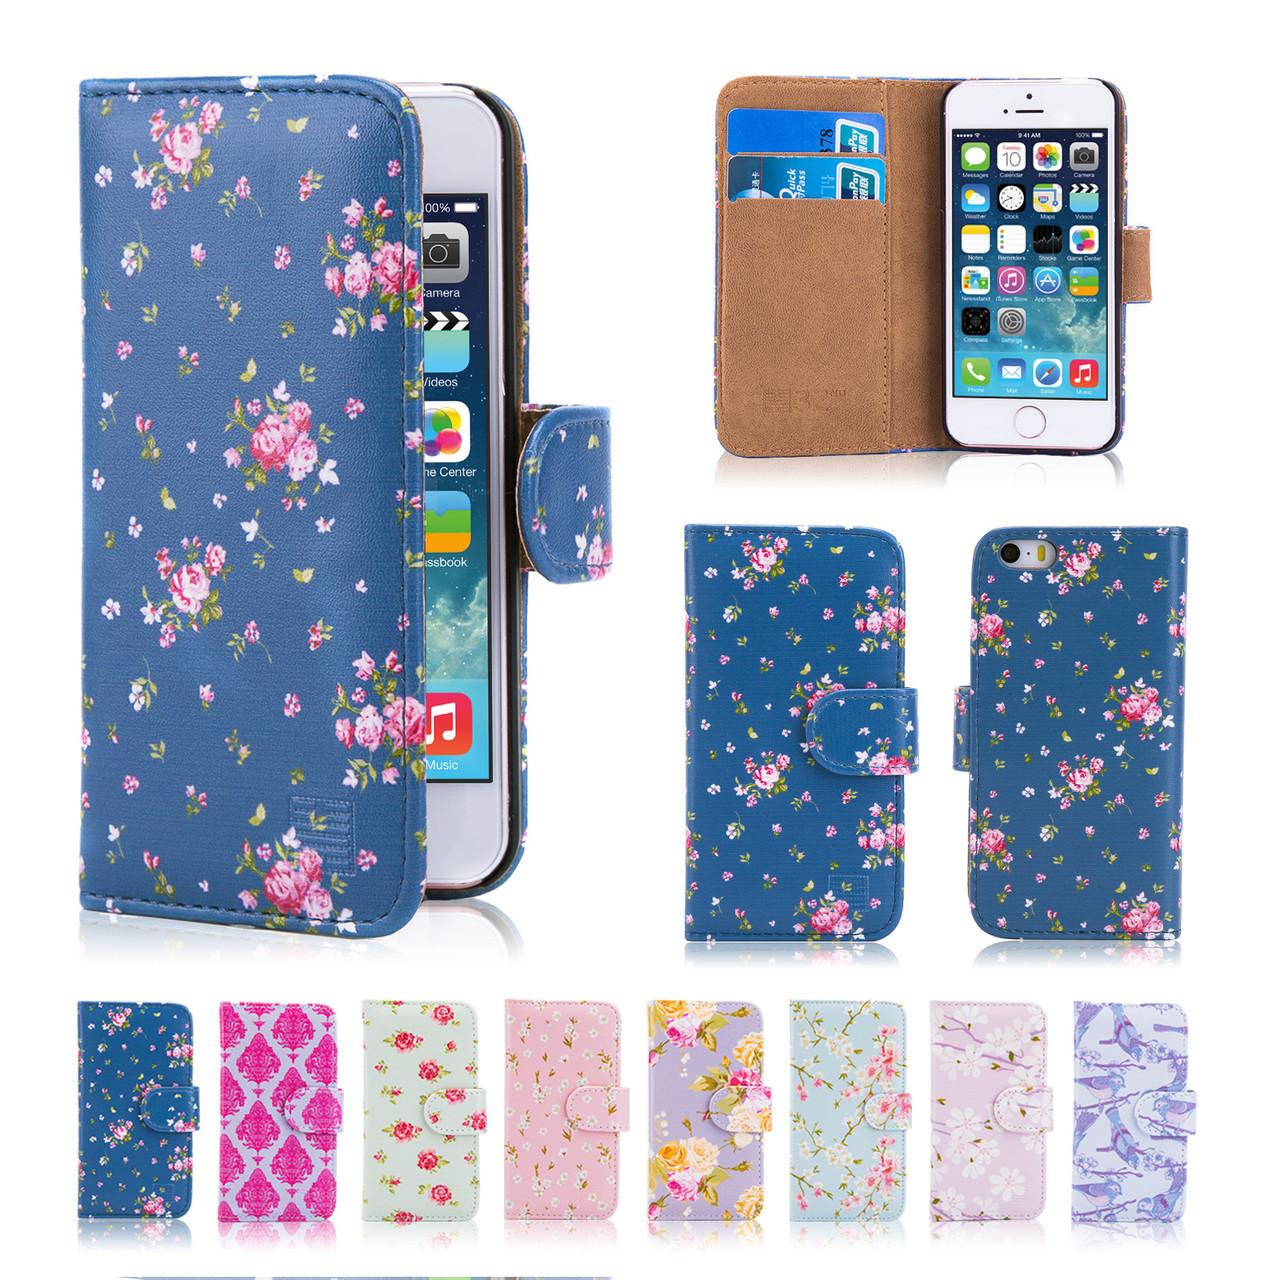 32nd iphone 8 plus case